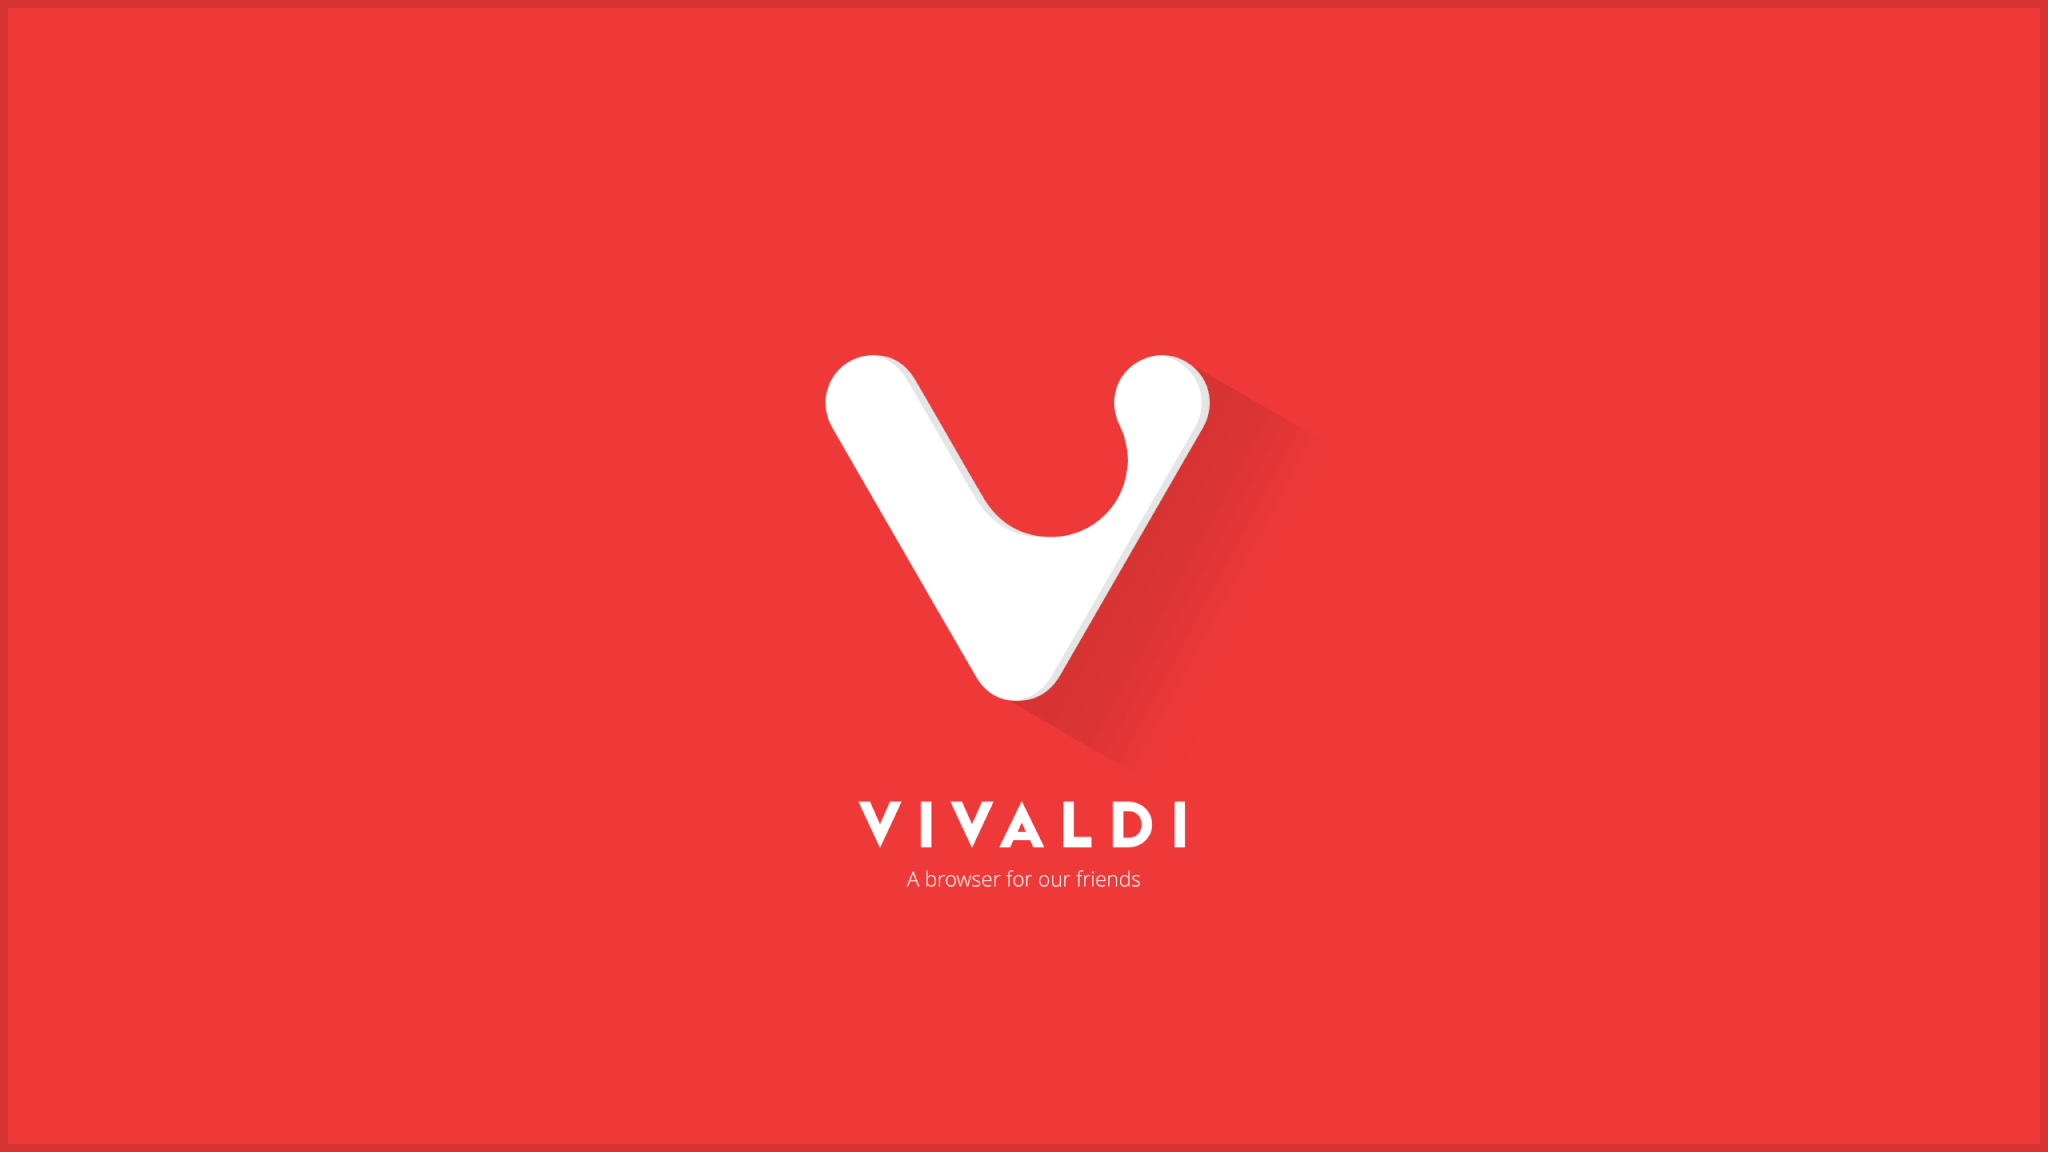 Vivaldi red